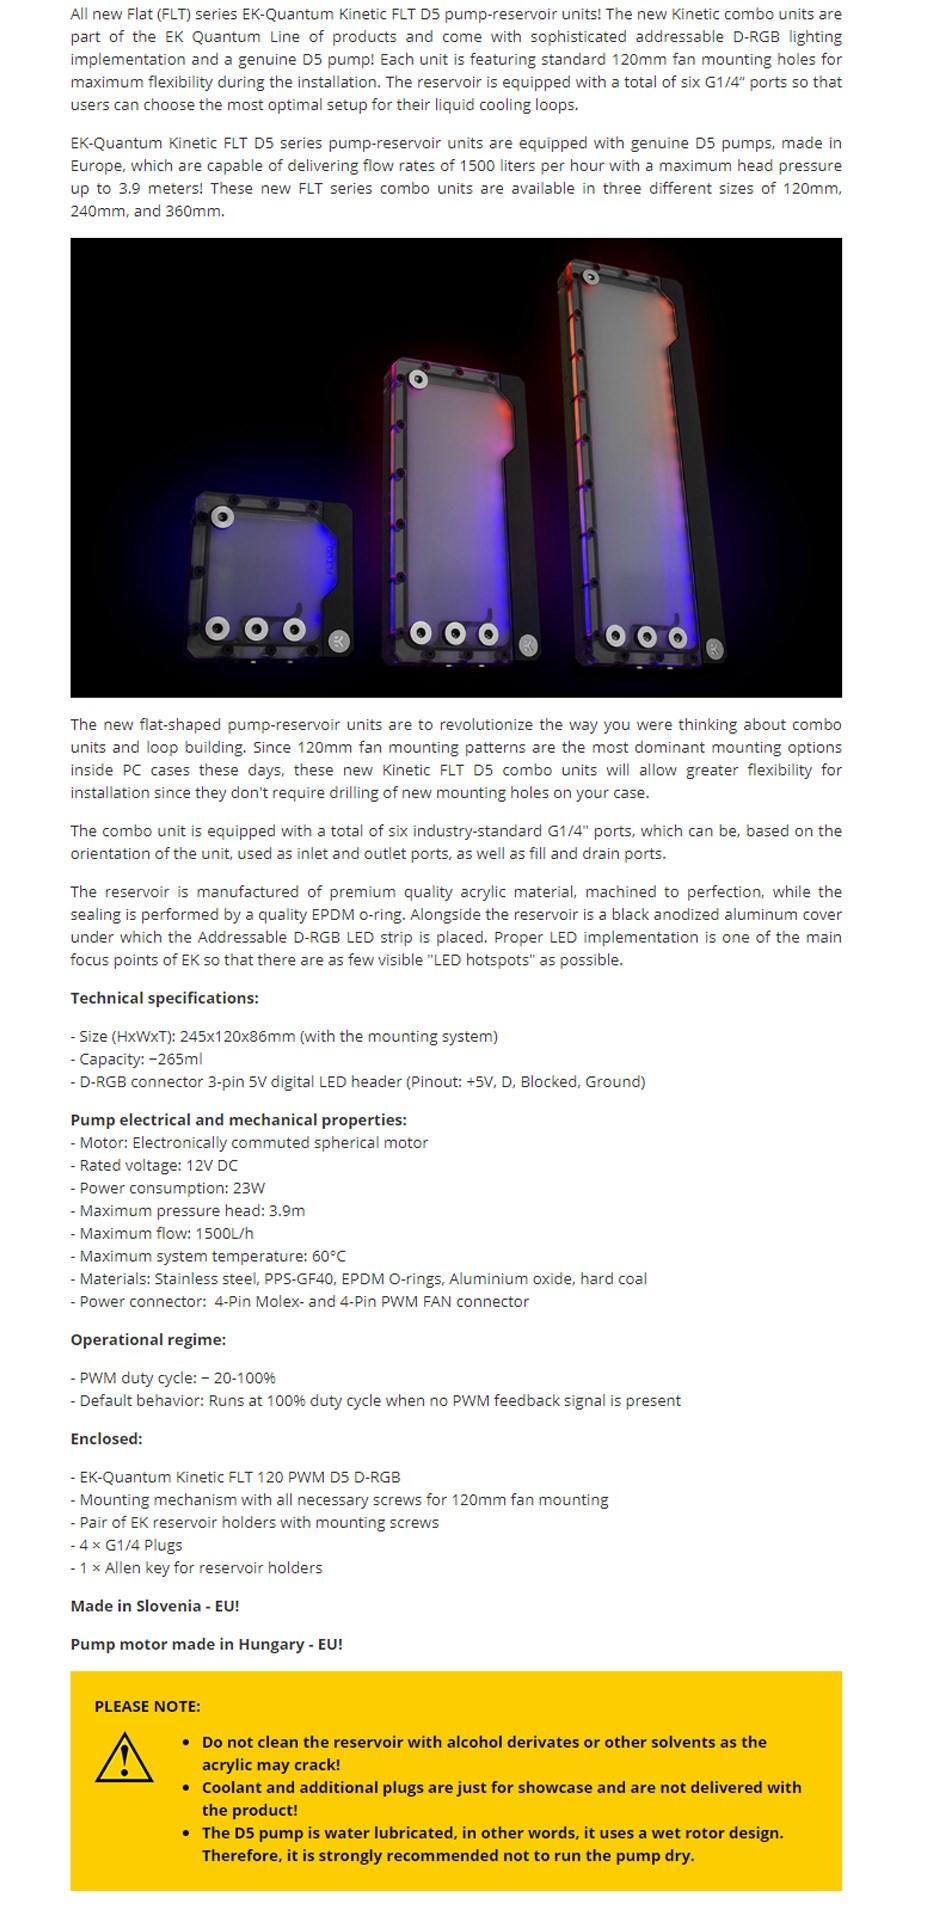 EKWB EK-Quantum Kinetic FLT 240 D5 PWM D-RGB Plexi Reservoir Pump Combo - Overview 1